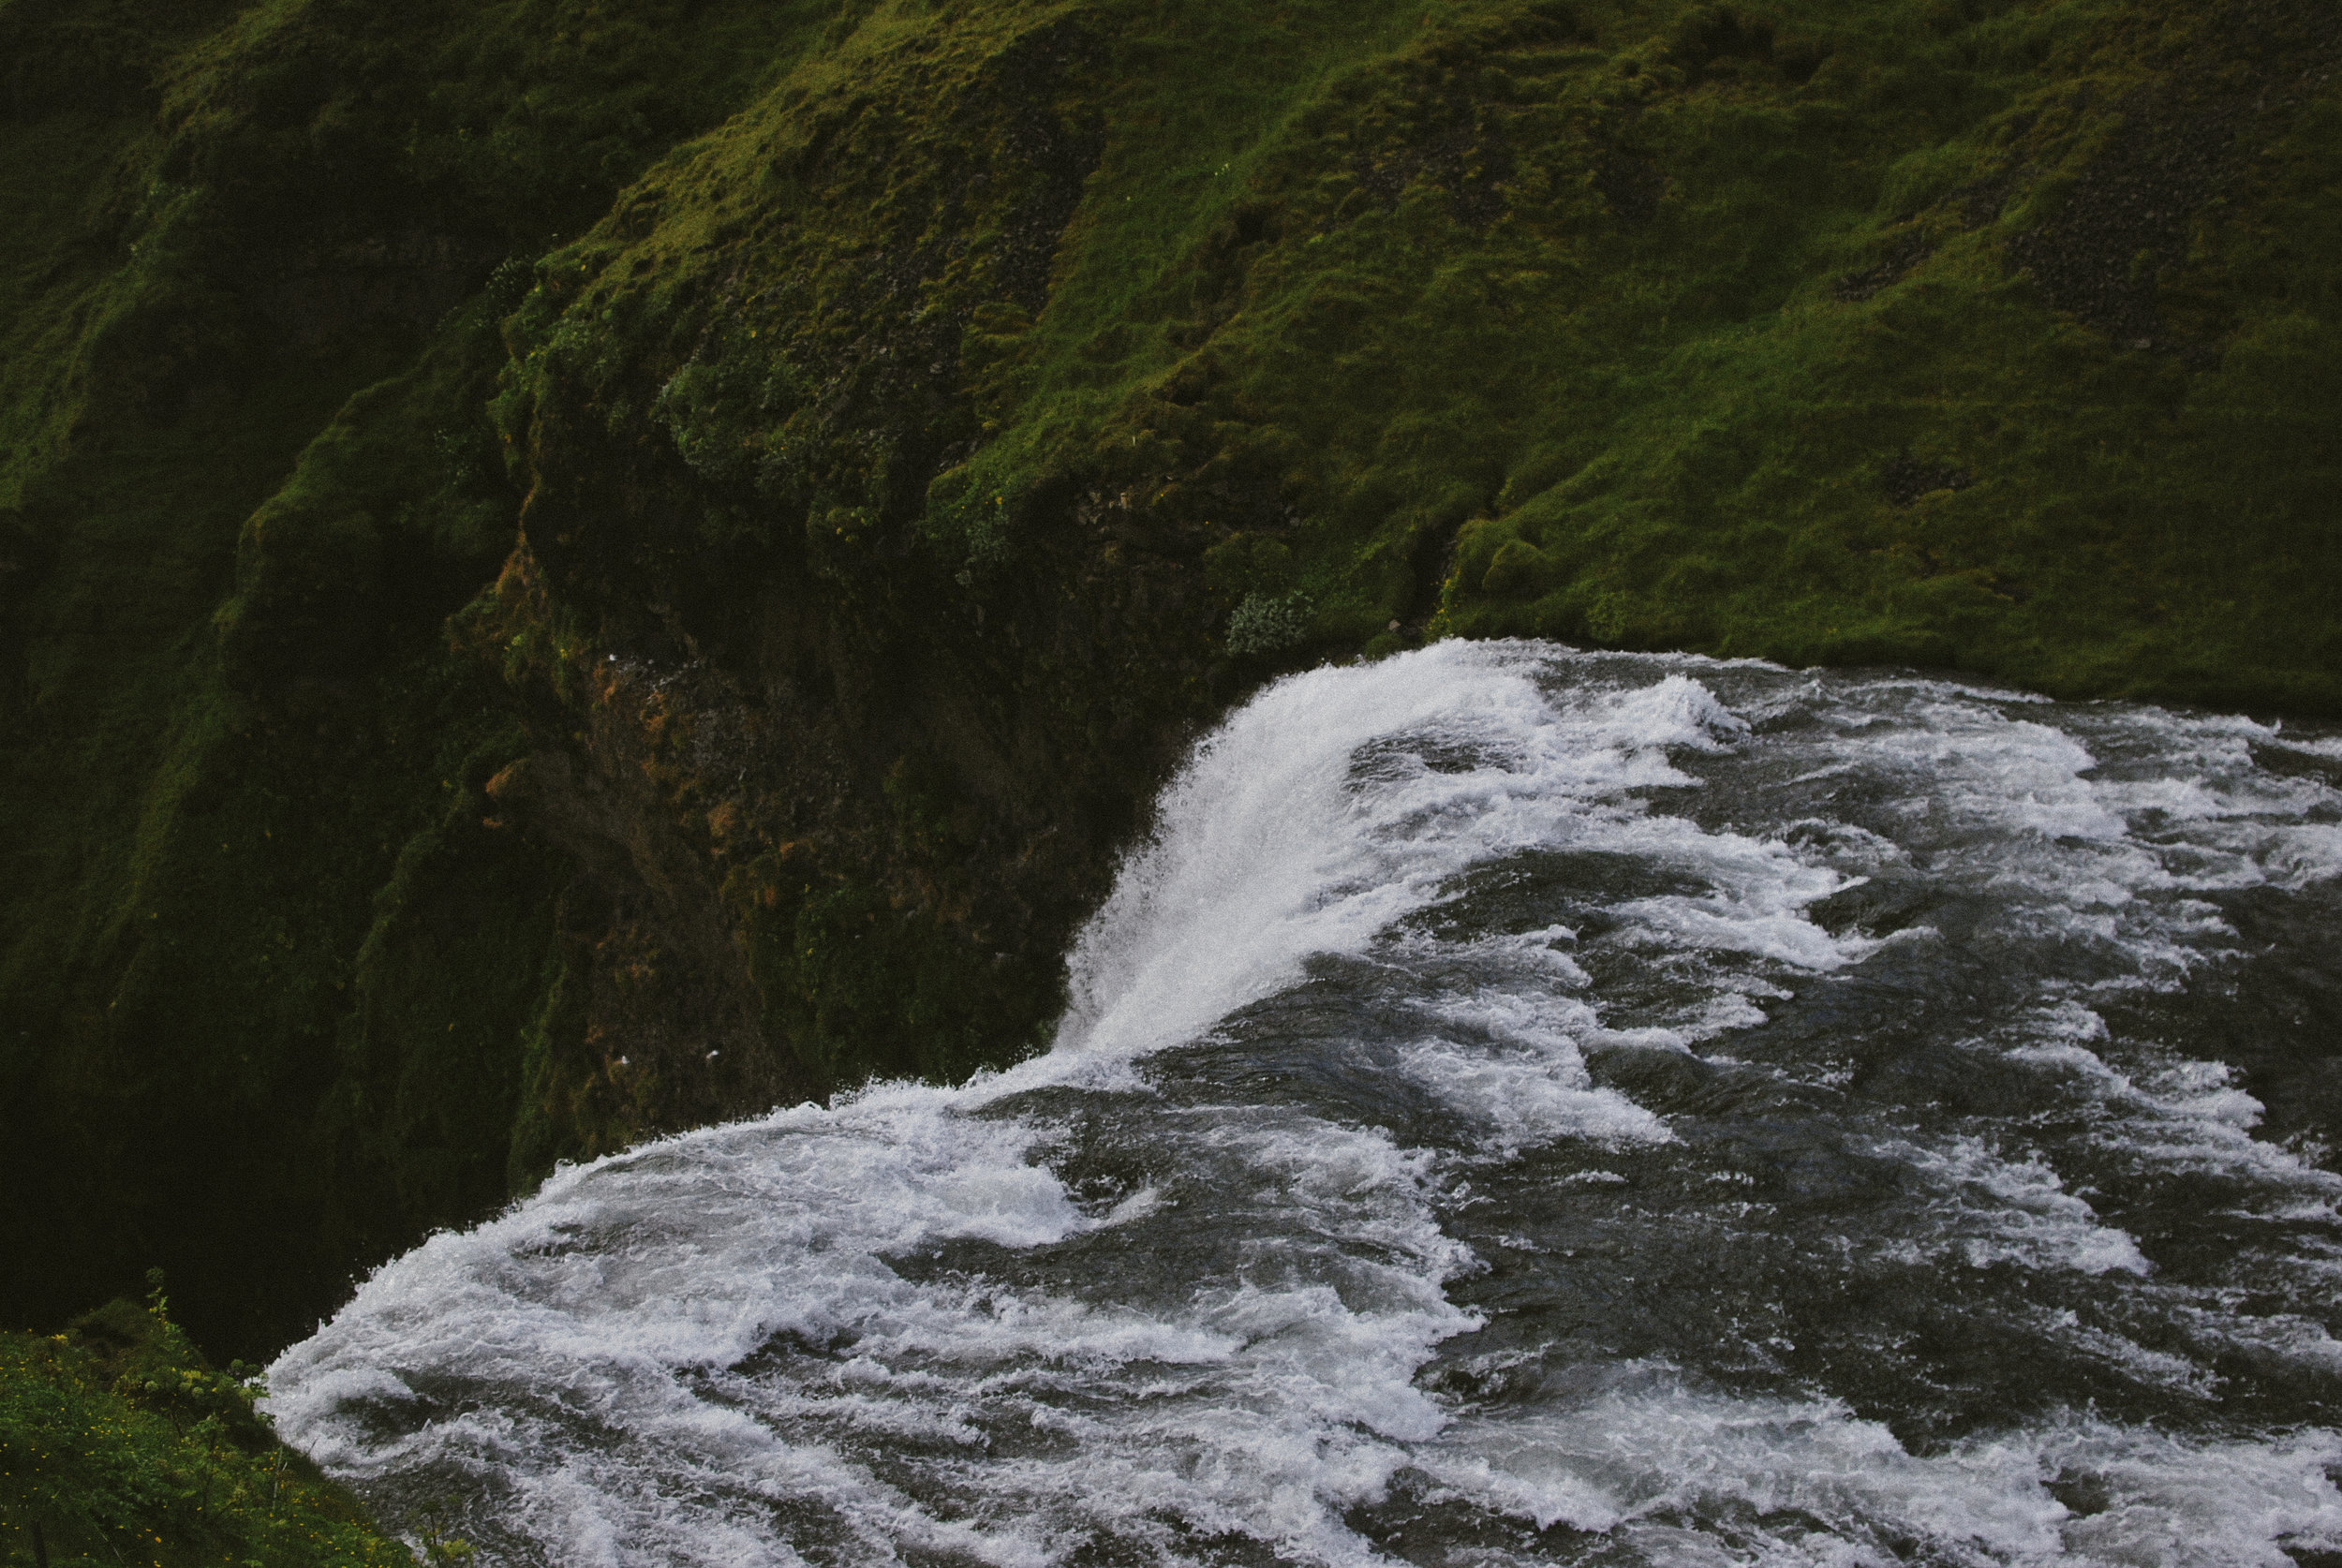 Iceland_Skogarfoss_Falls_Upper2.jpg